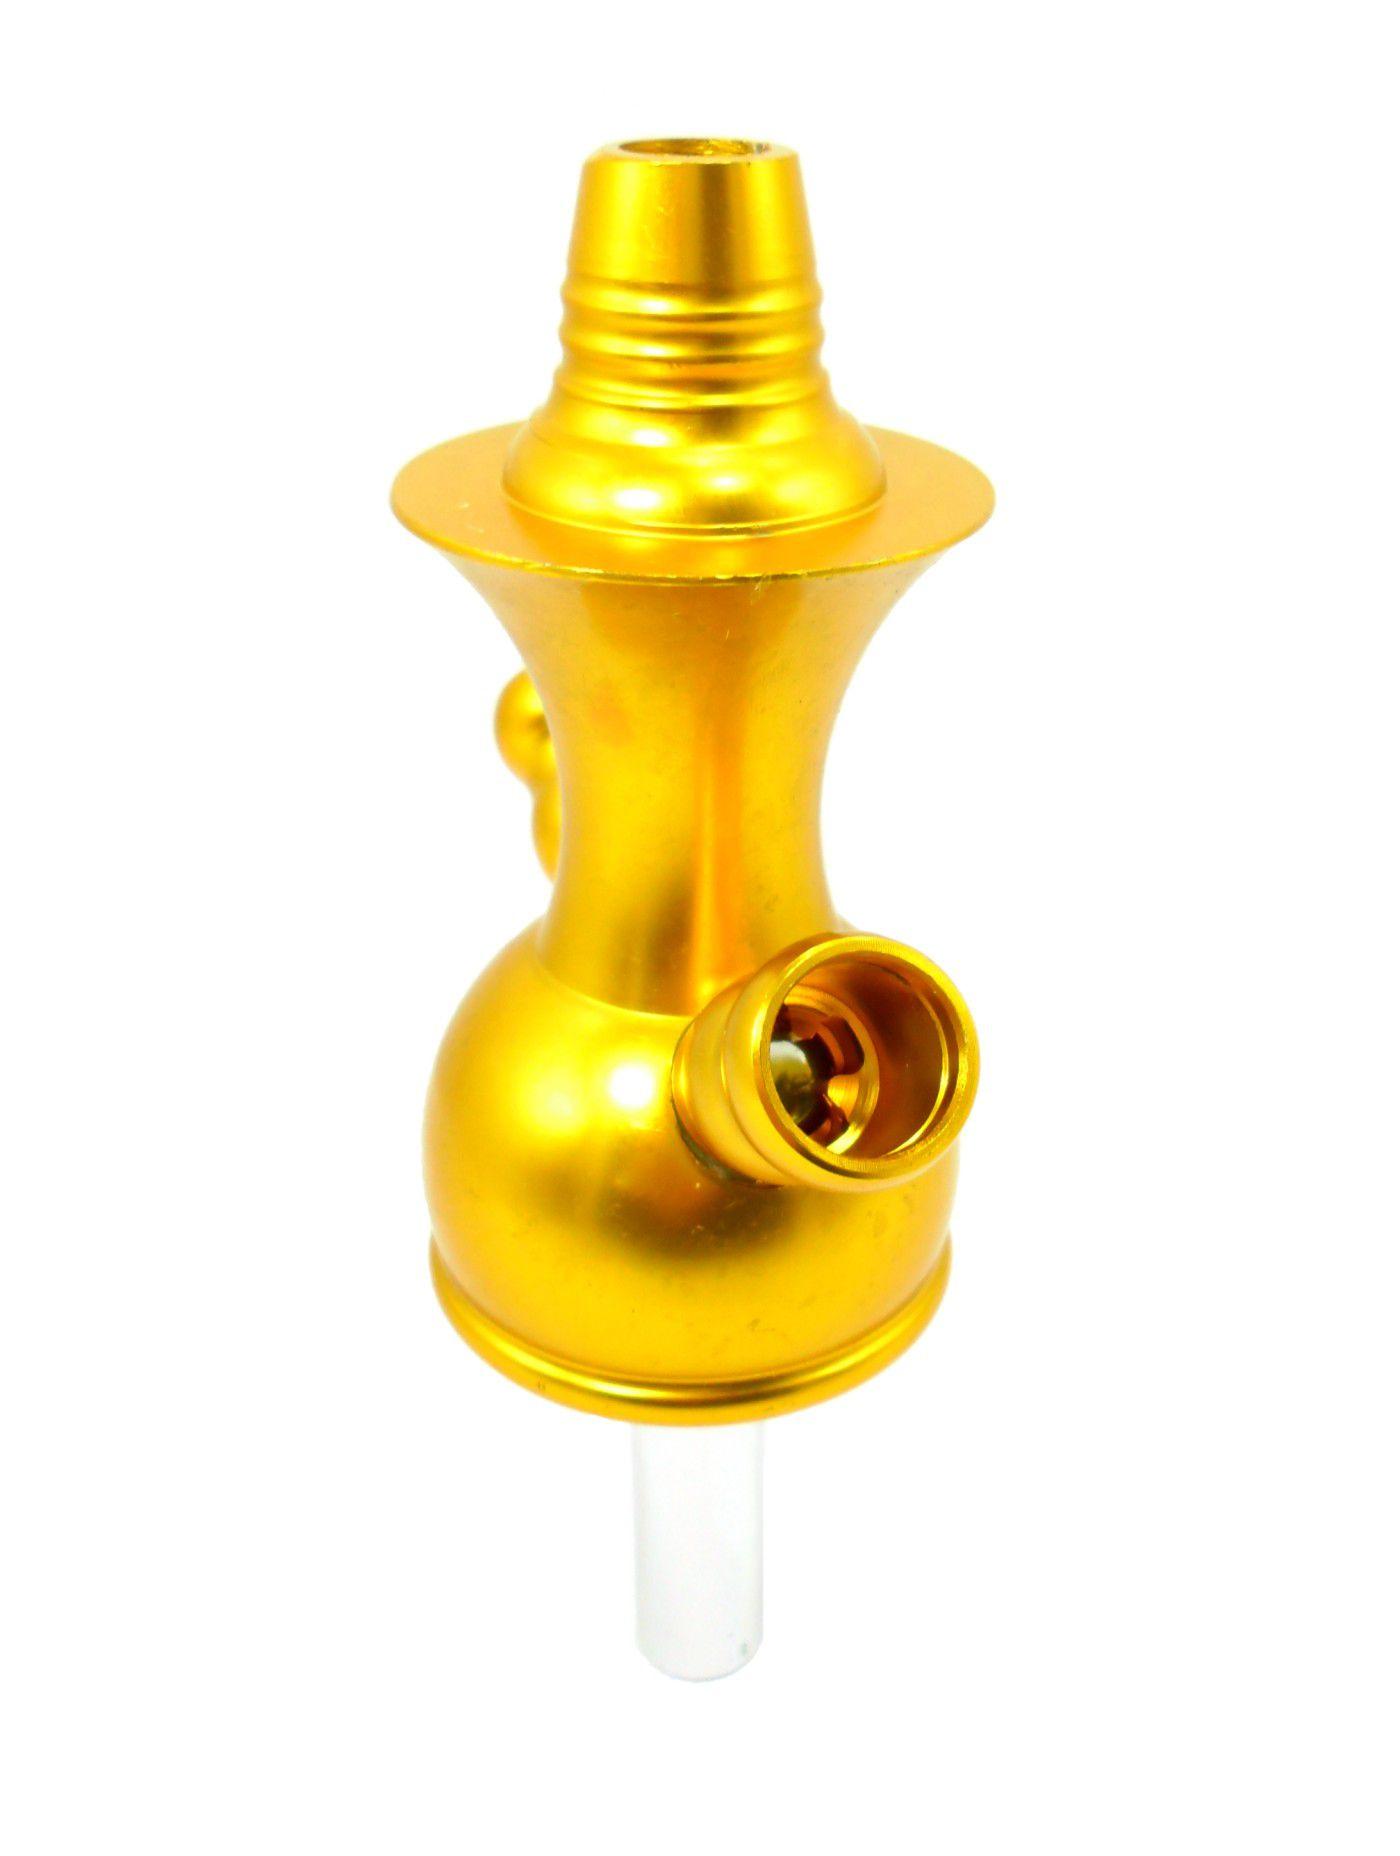 Stem (corpo de narguile) YAHYA A119 (Monte Verde) 2 saídas de mangueira, alumínio anodizado dourado